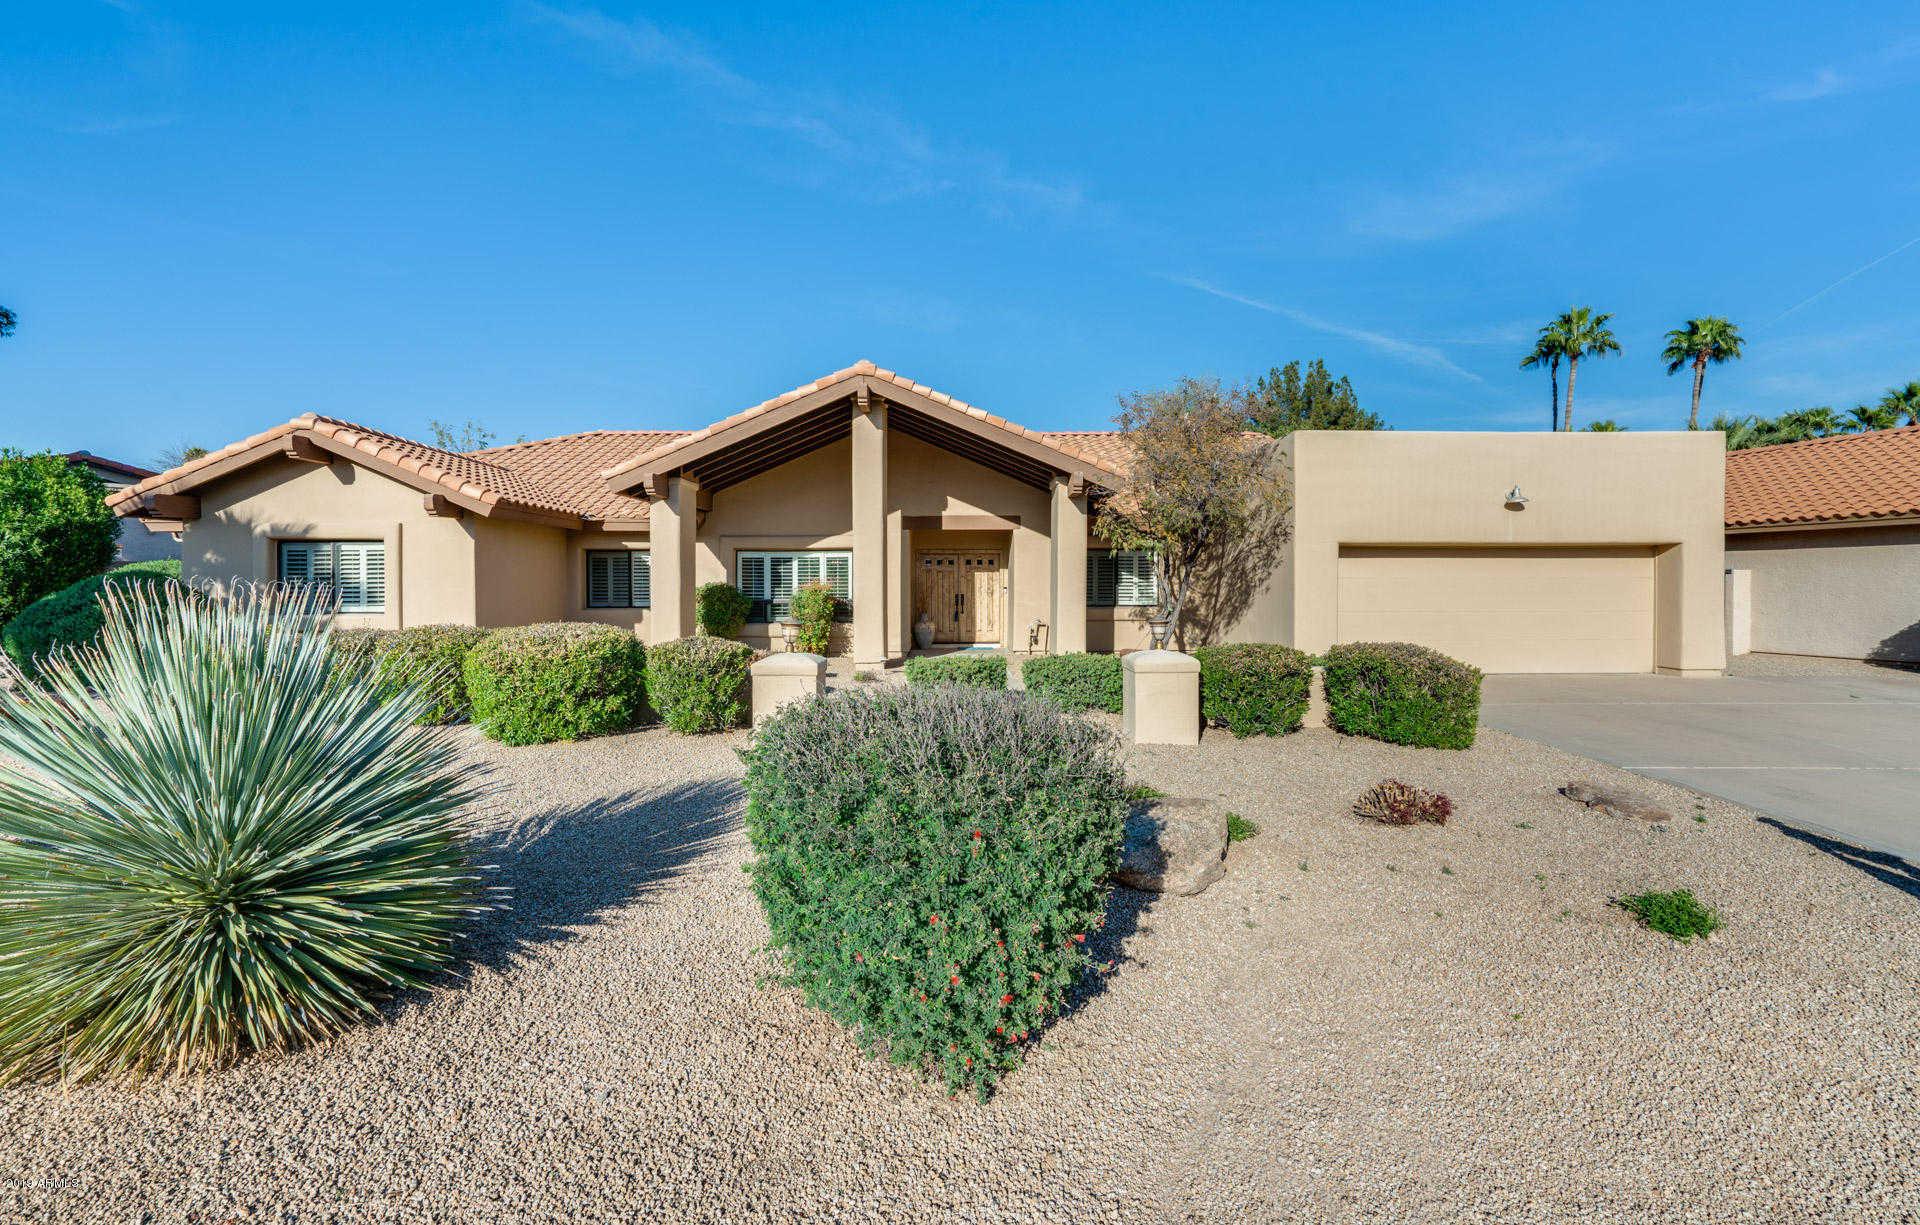 $799,000 - 5Br/3Ba - Home for Sale in Buenavante, Scottsdale